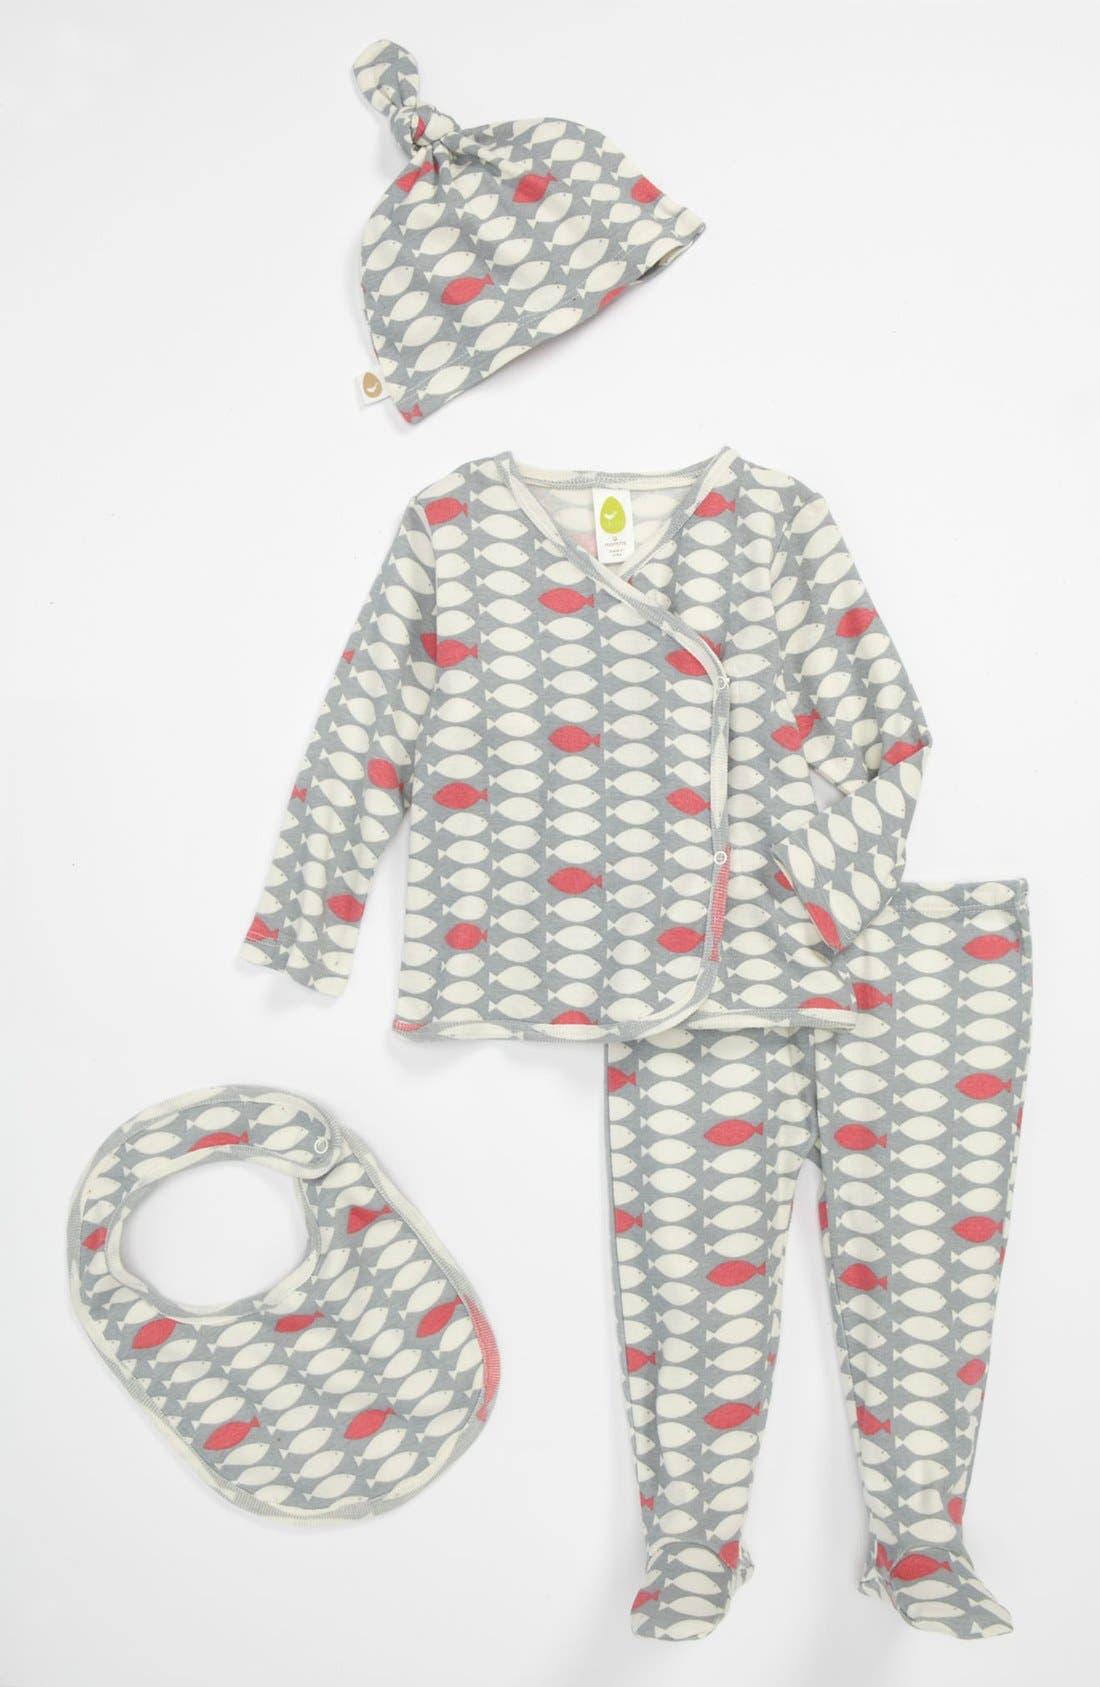 Main Image - Stem Baby Organic Cotton Shirt, Pants, Hat & Bib (Baby Girls)